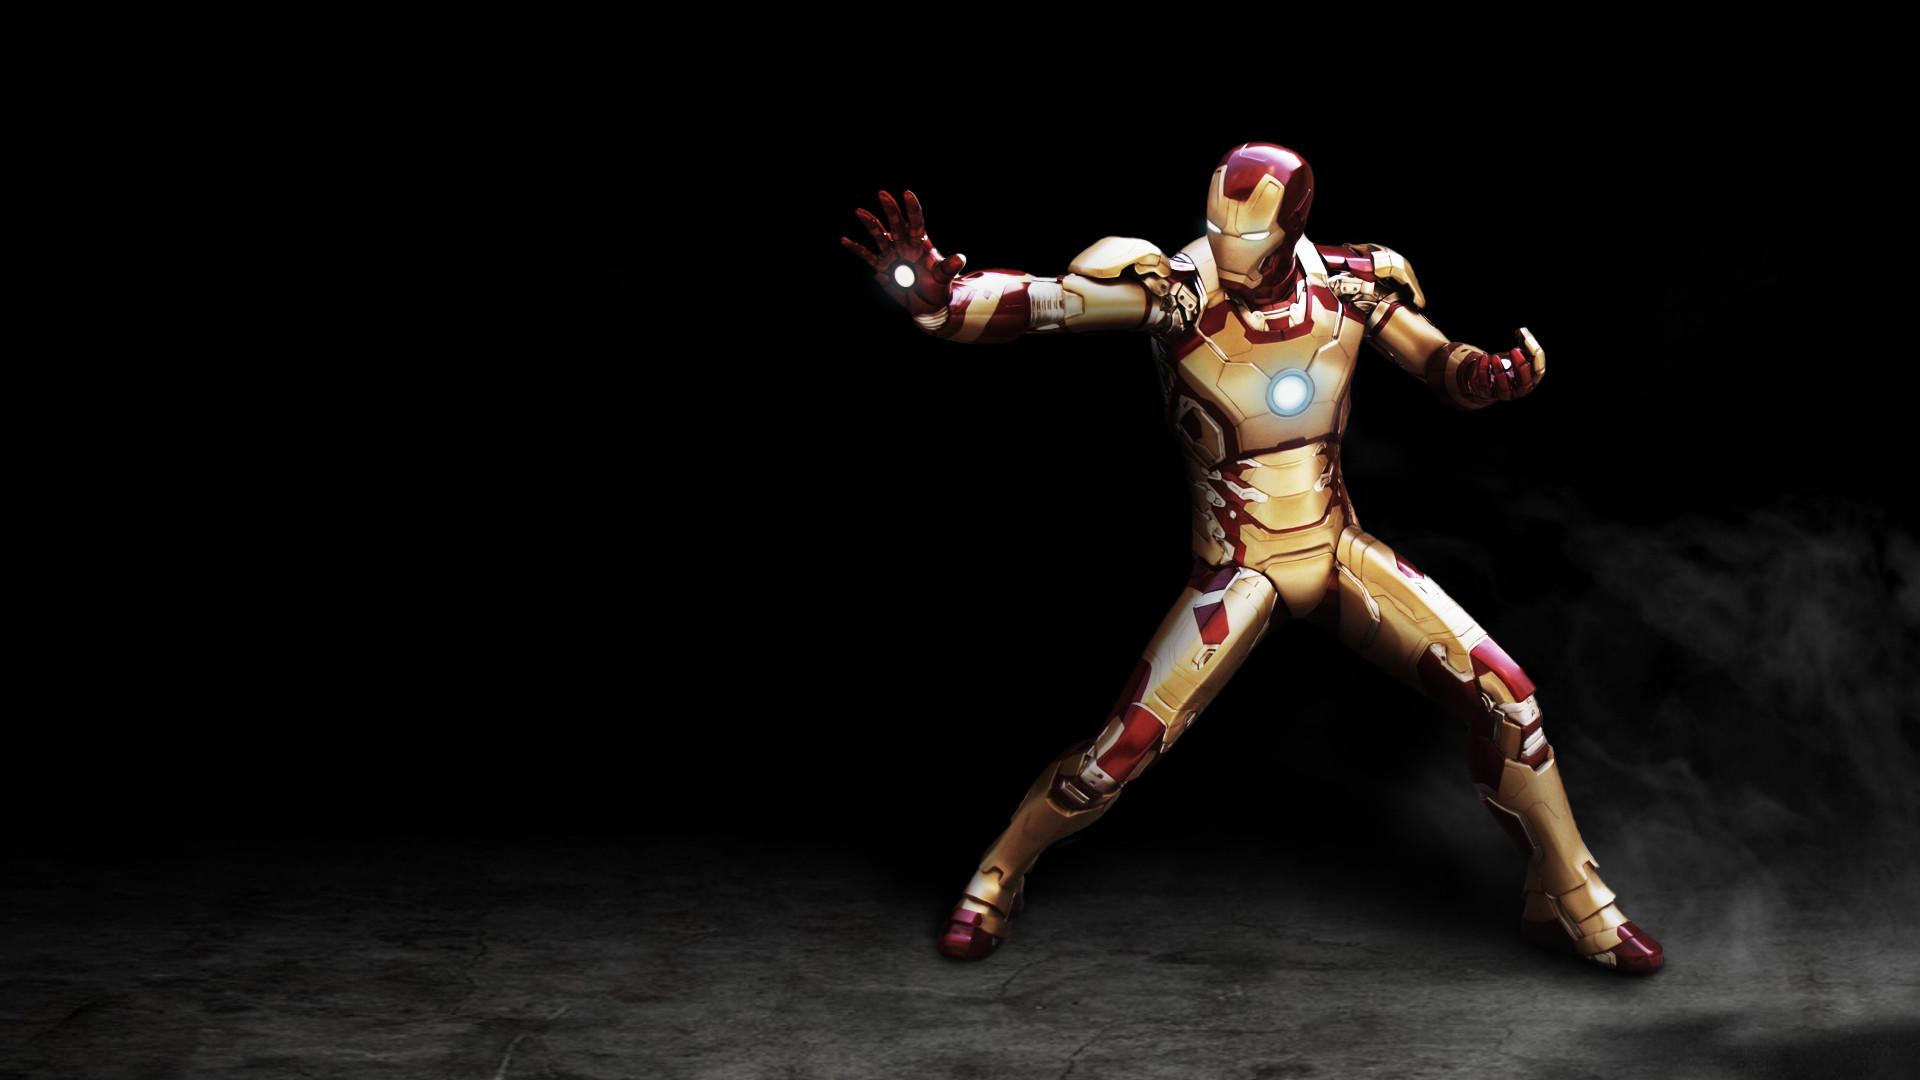 3D Iron Man Wallpapers (68 Wallpapers)